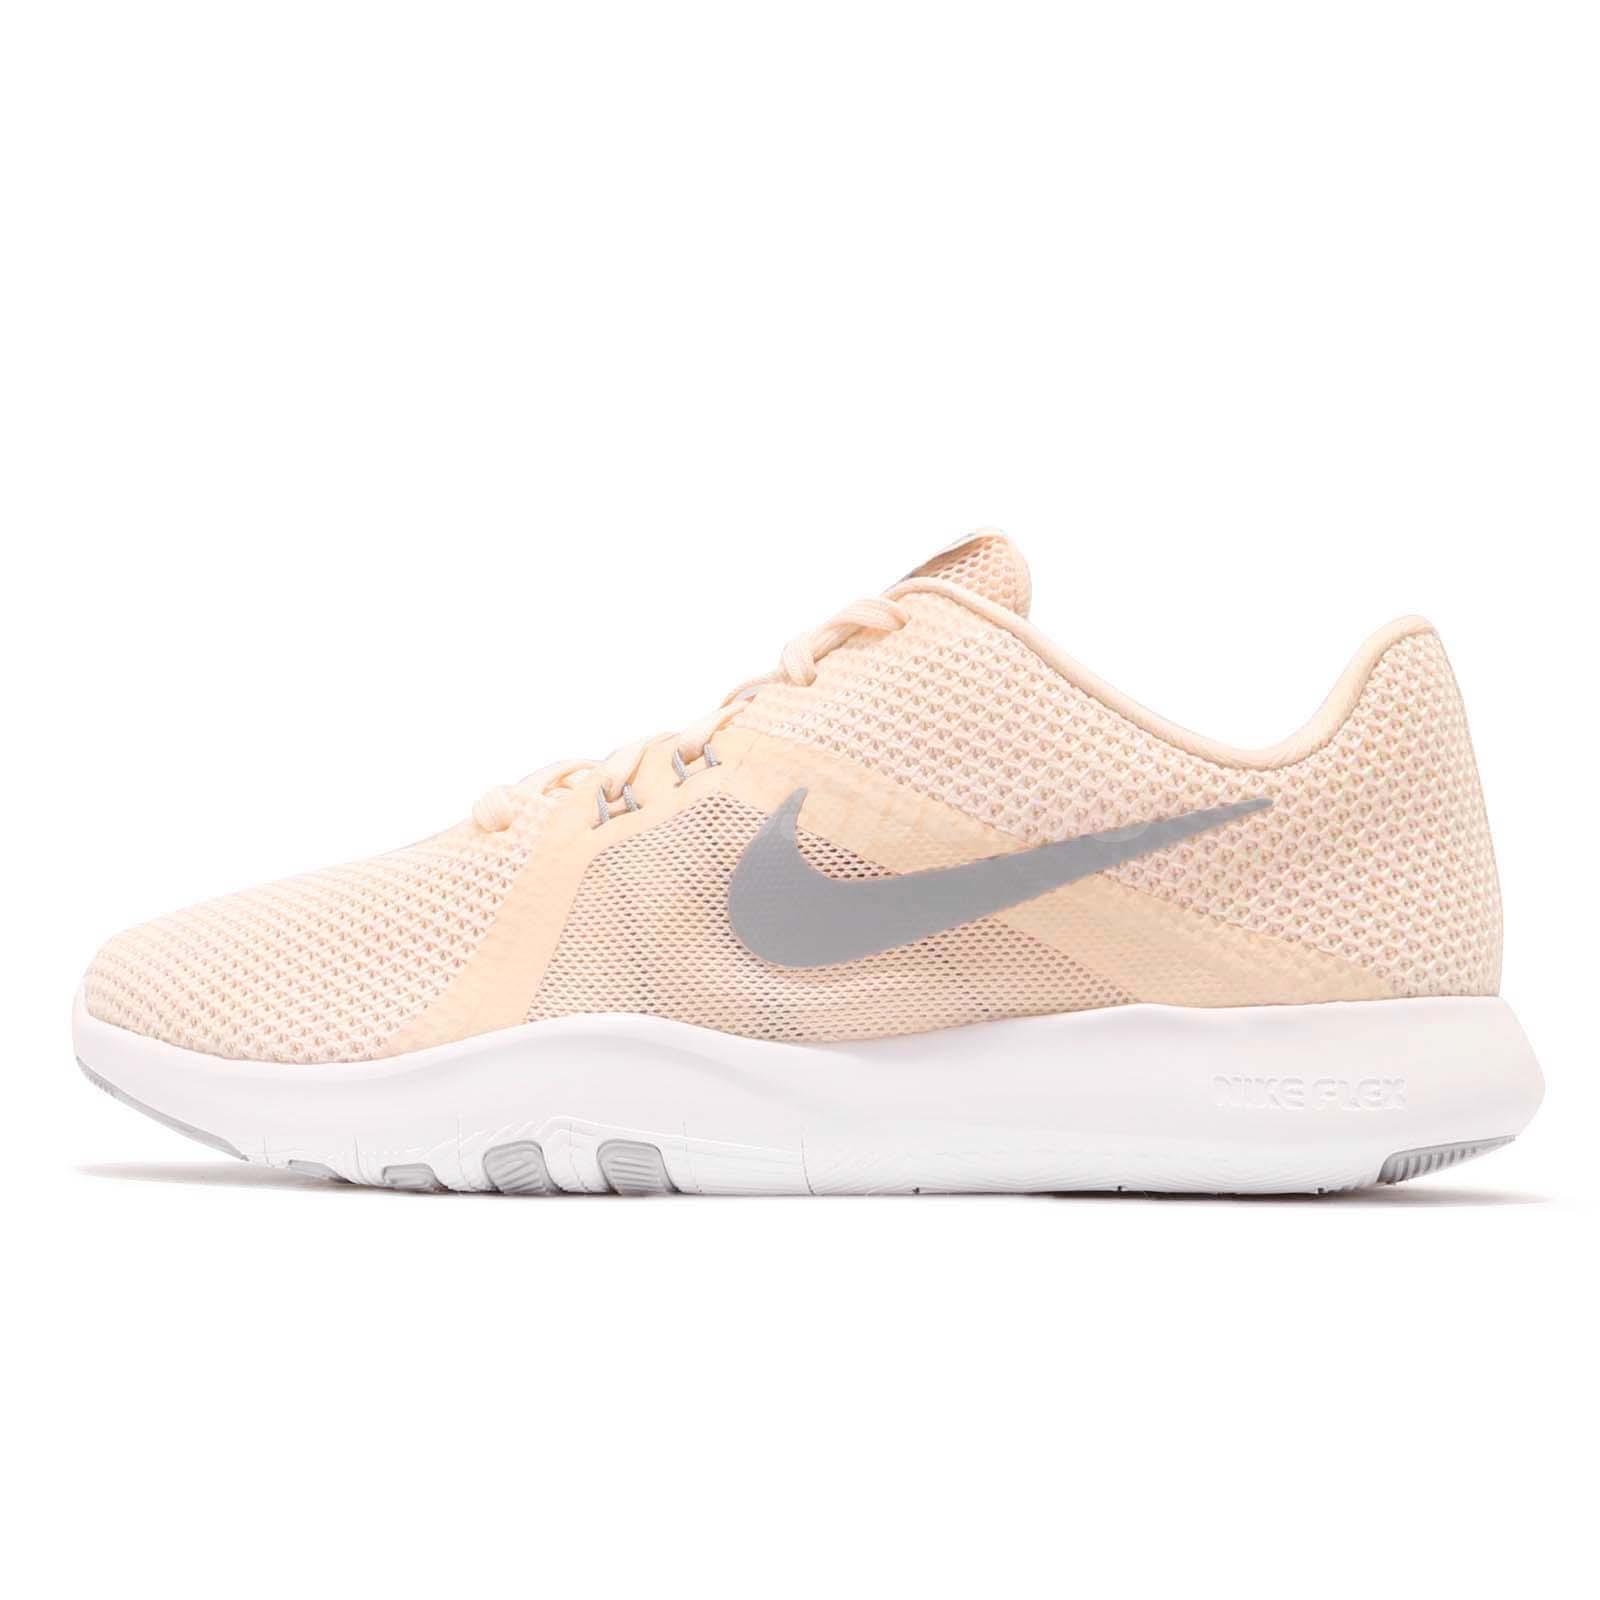 afe4926b1d74 Nike Wmns Flex Trainer 8 VIII Guava Ice Grey Women Cross Training 924339-801